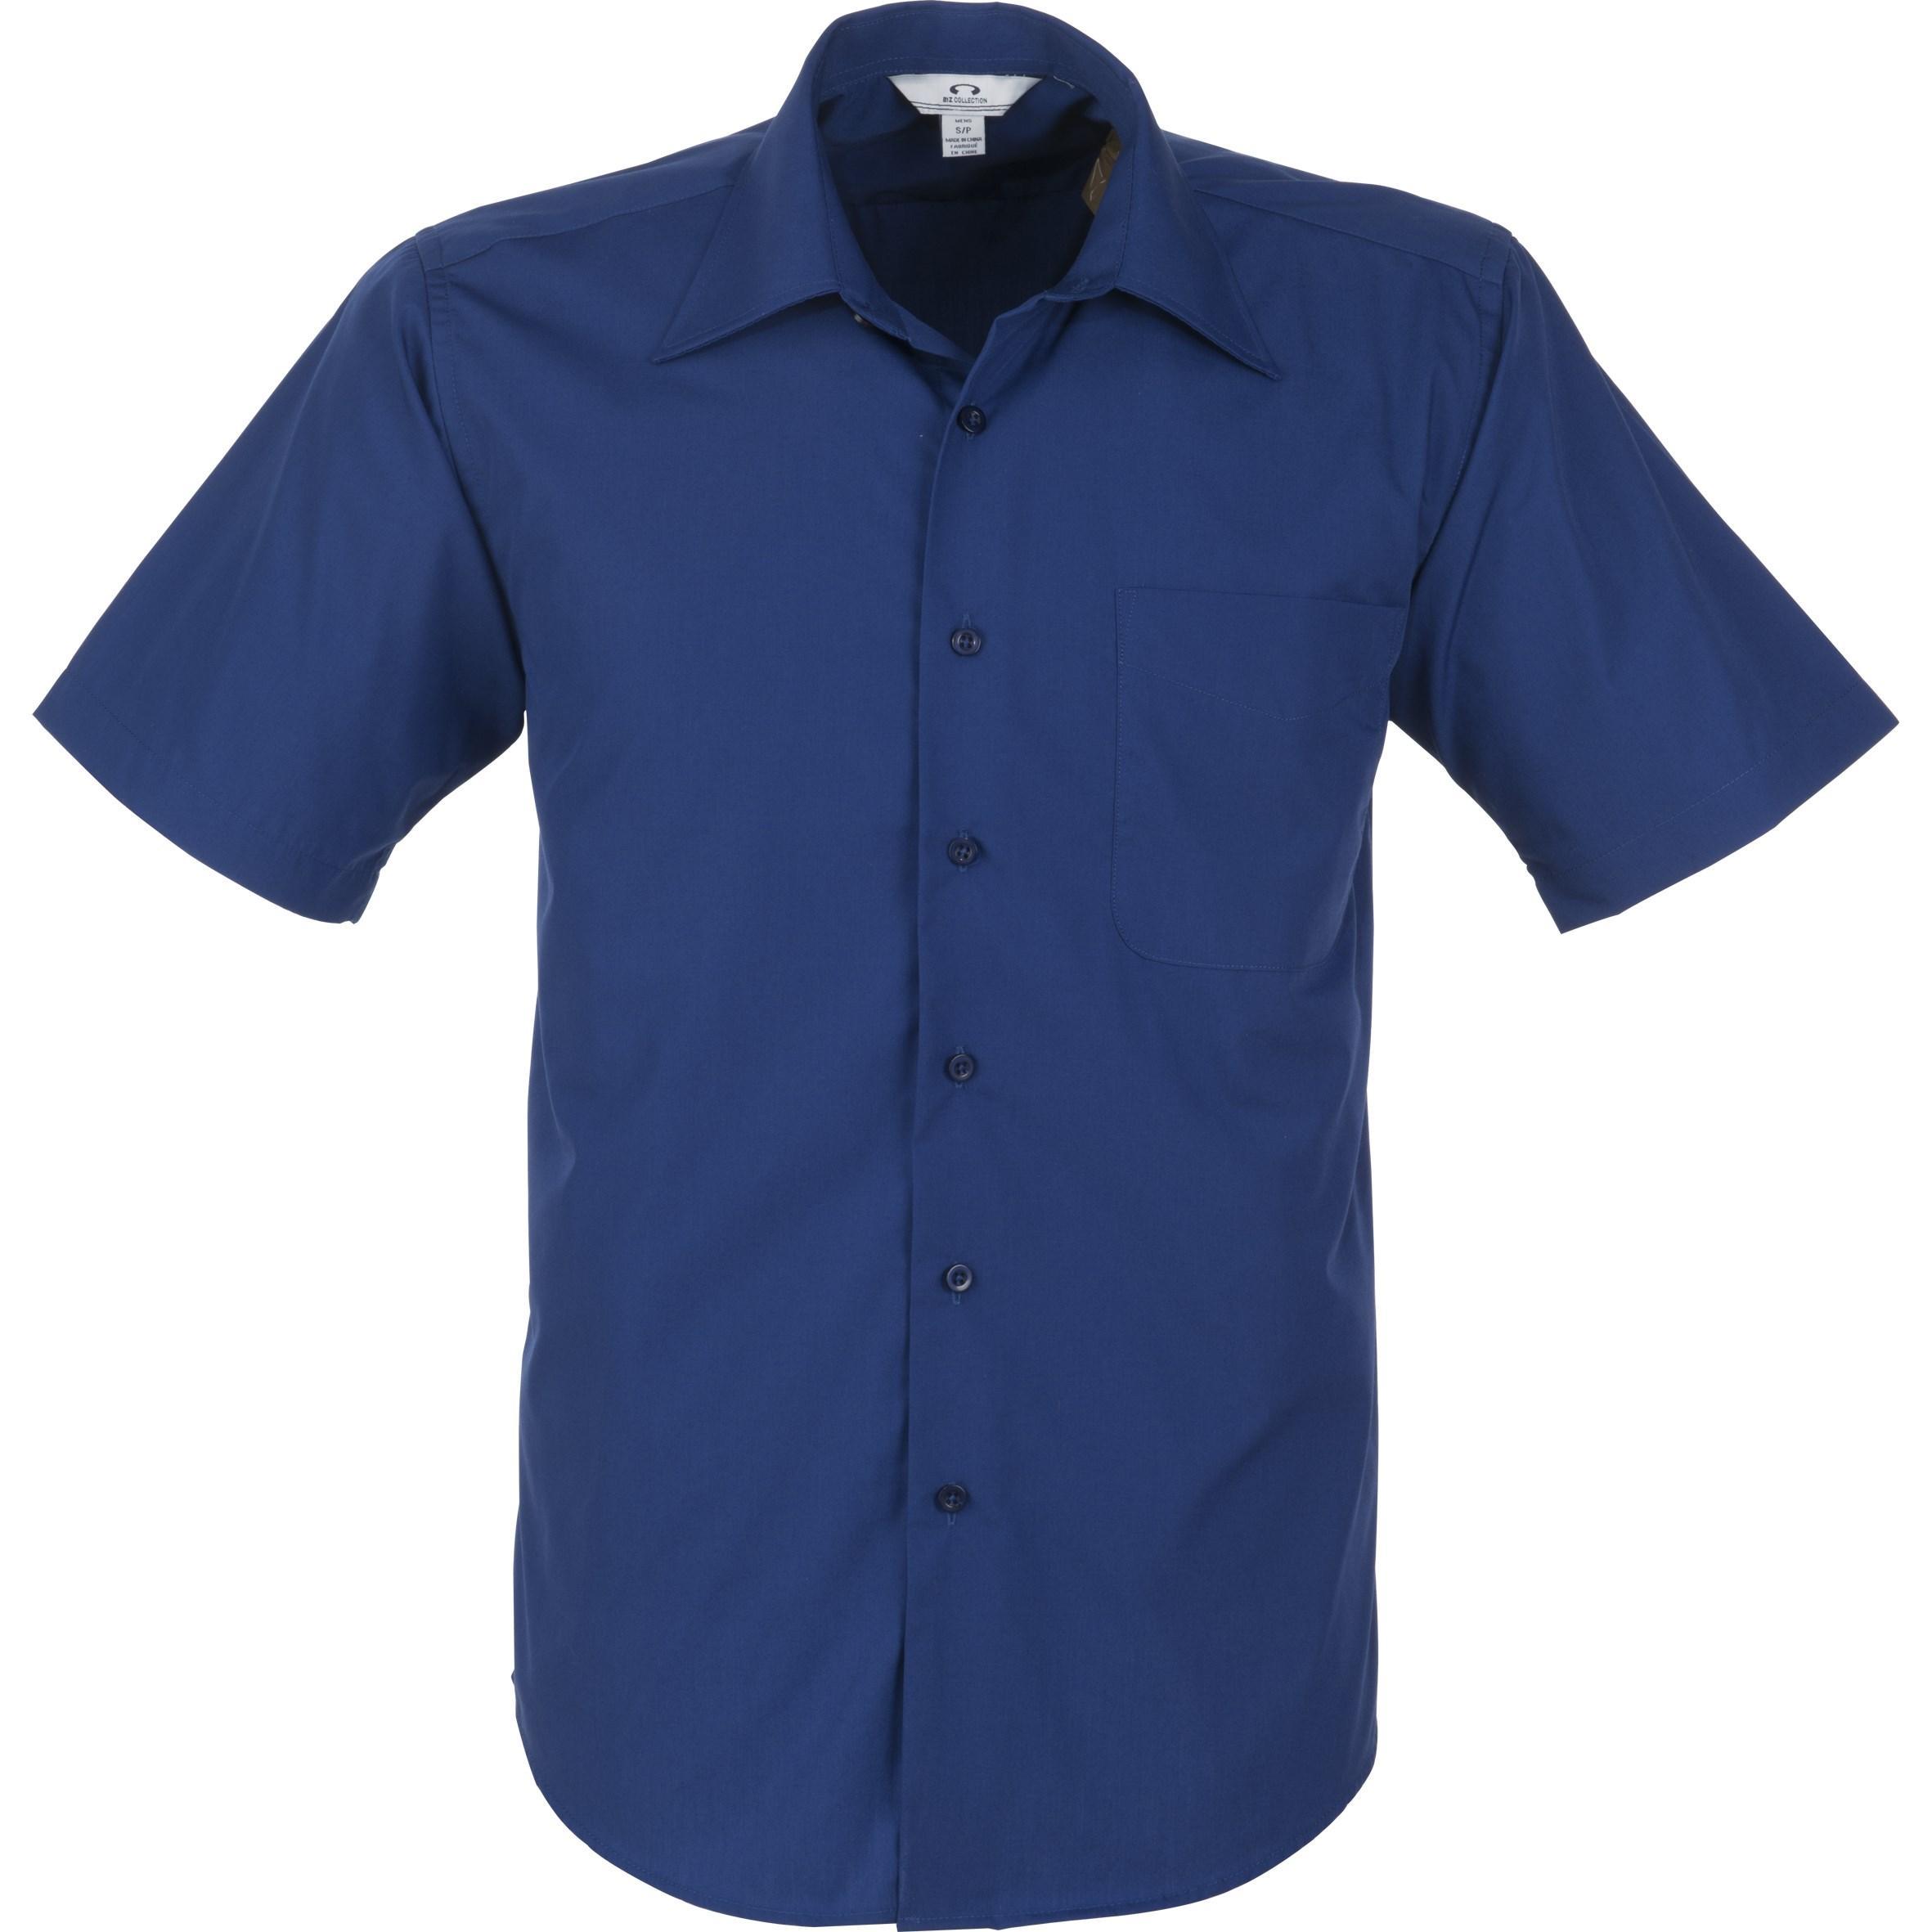 Mens Short Sleeve Metro Shirt - Royal Blue Only